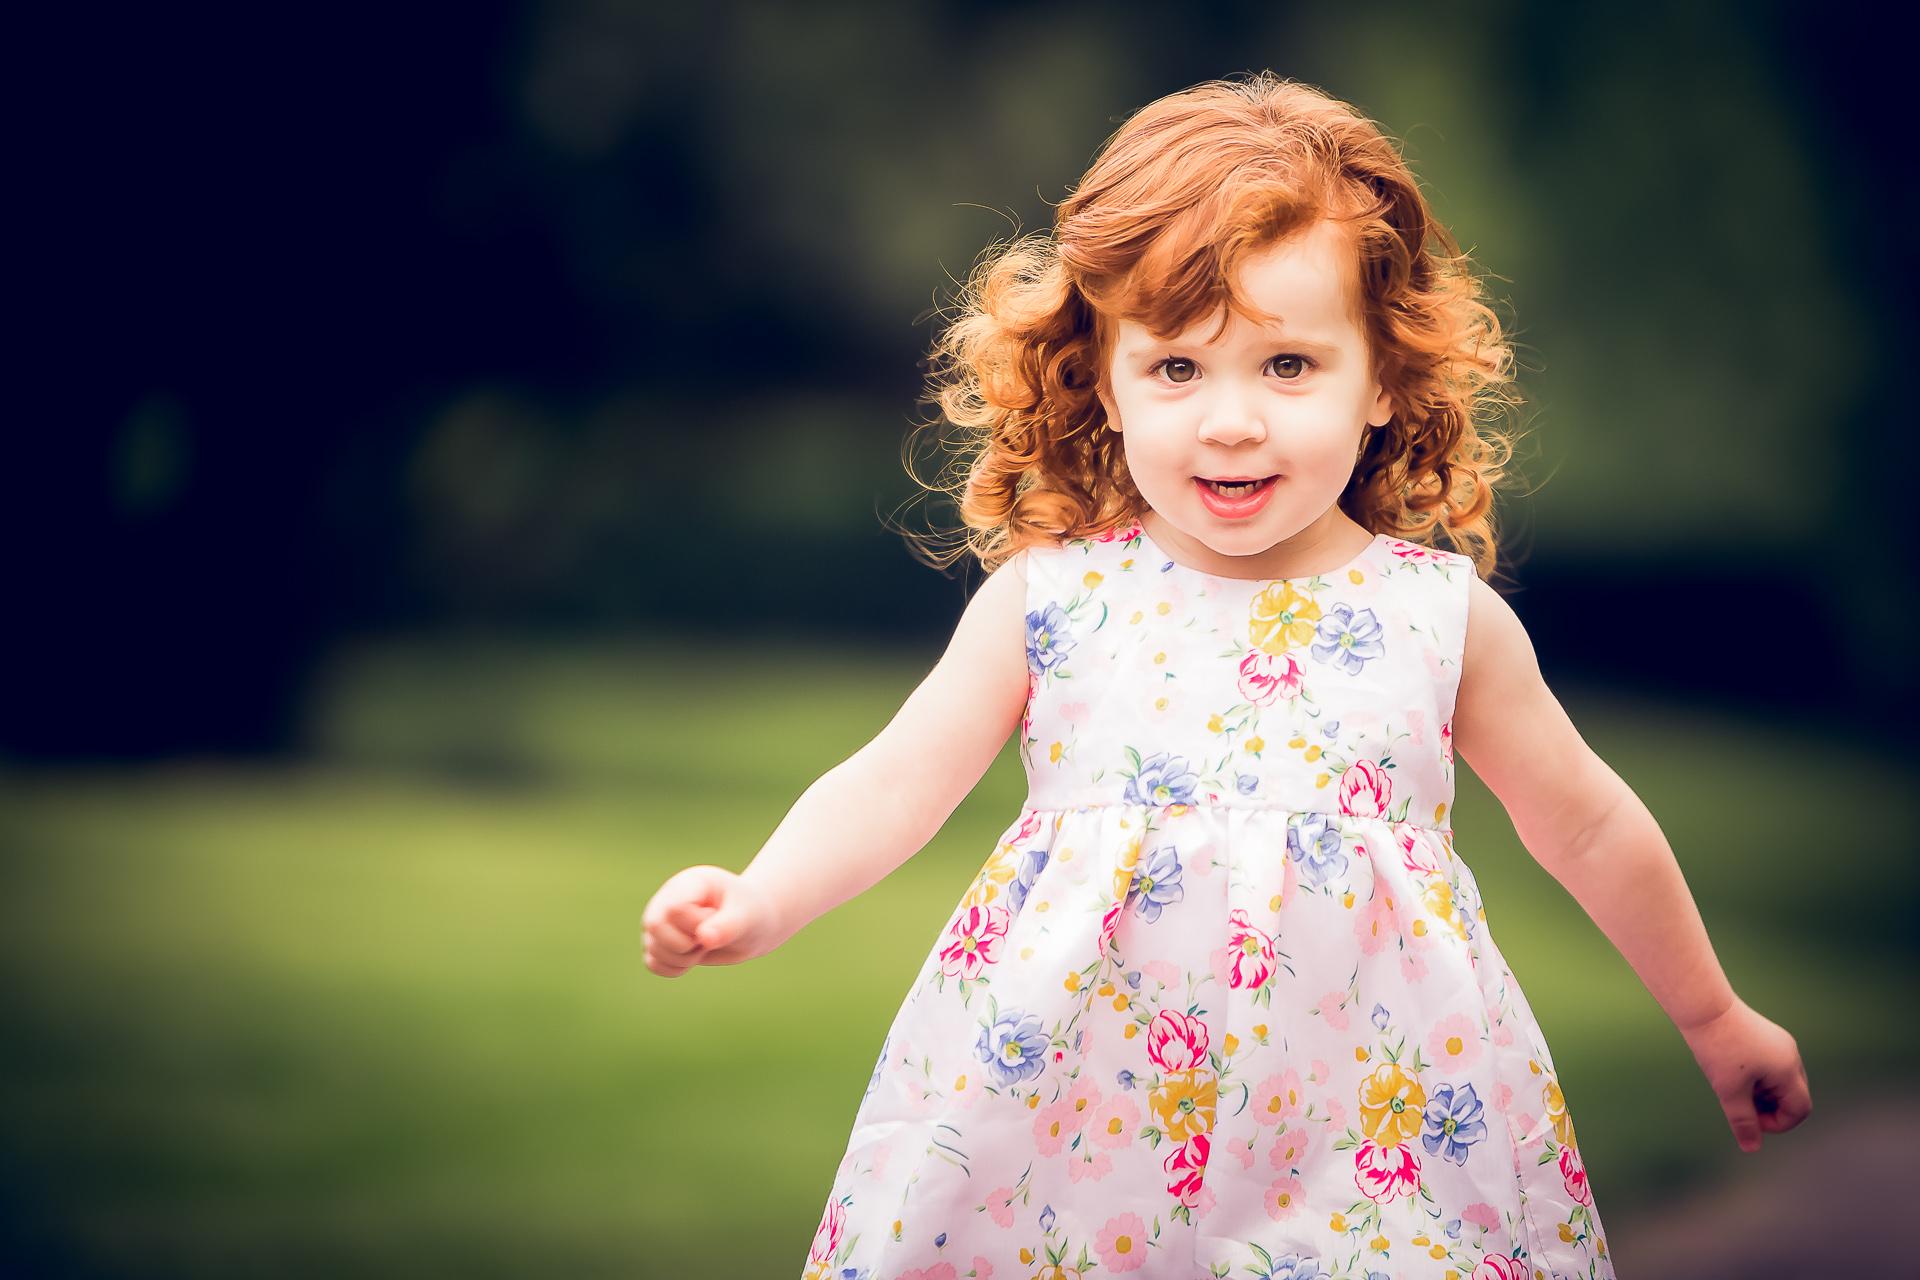 urbandale-children-photography-1.jpg